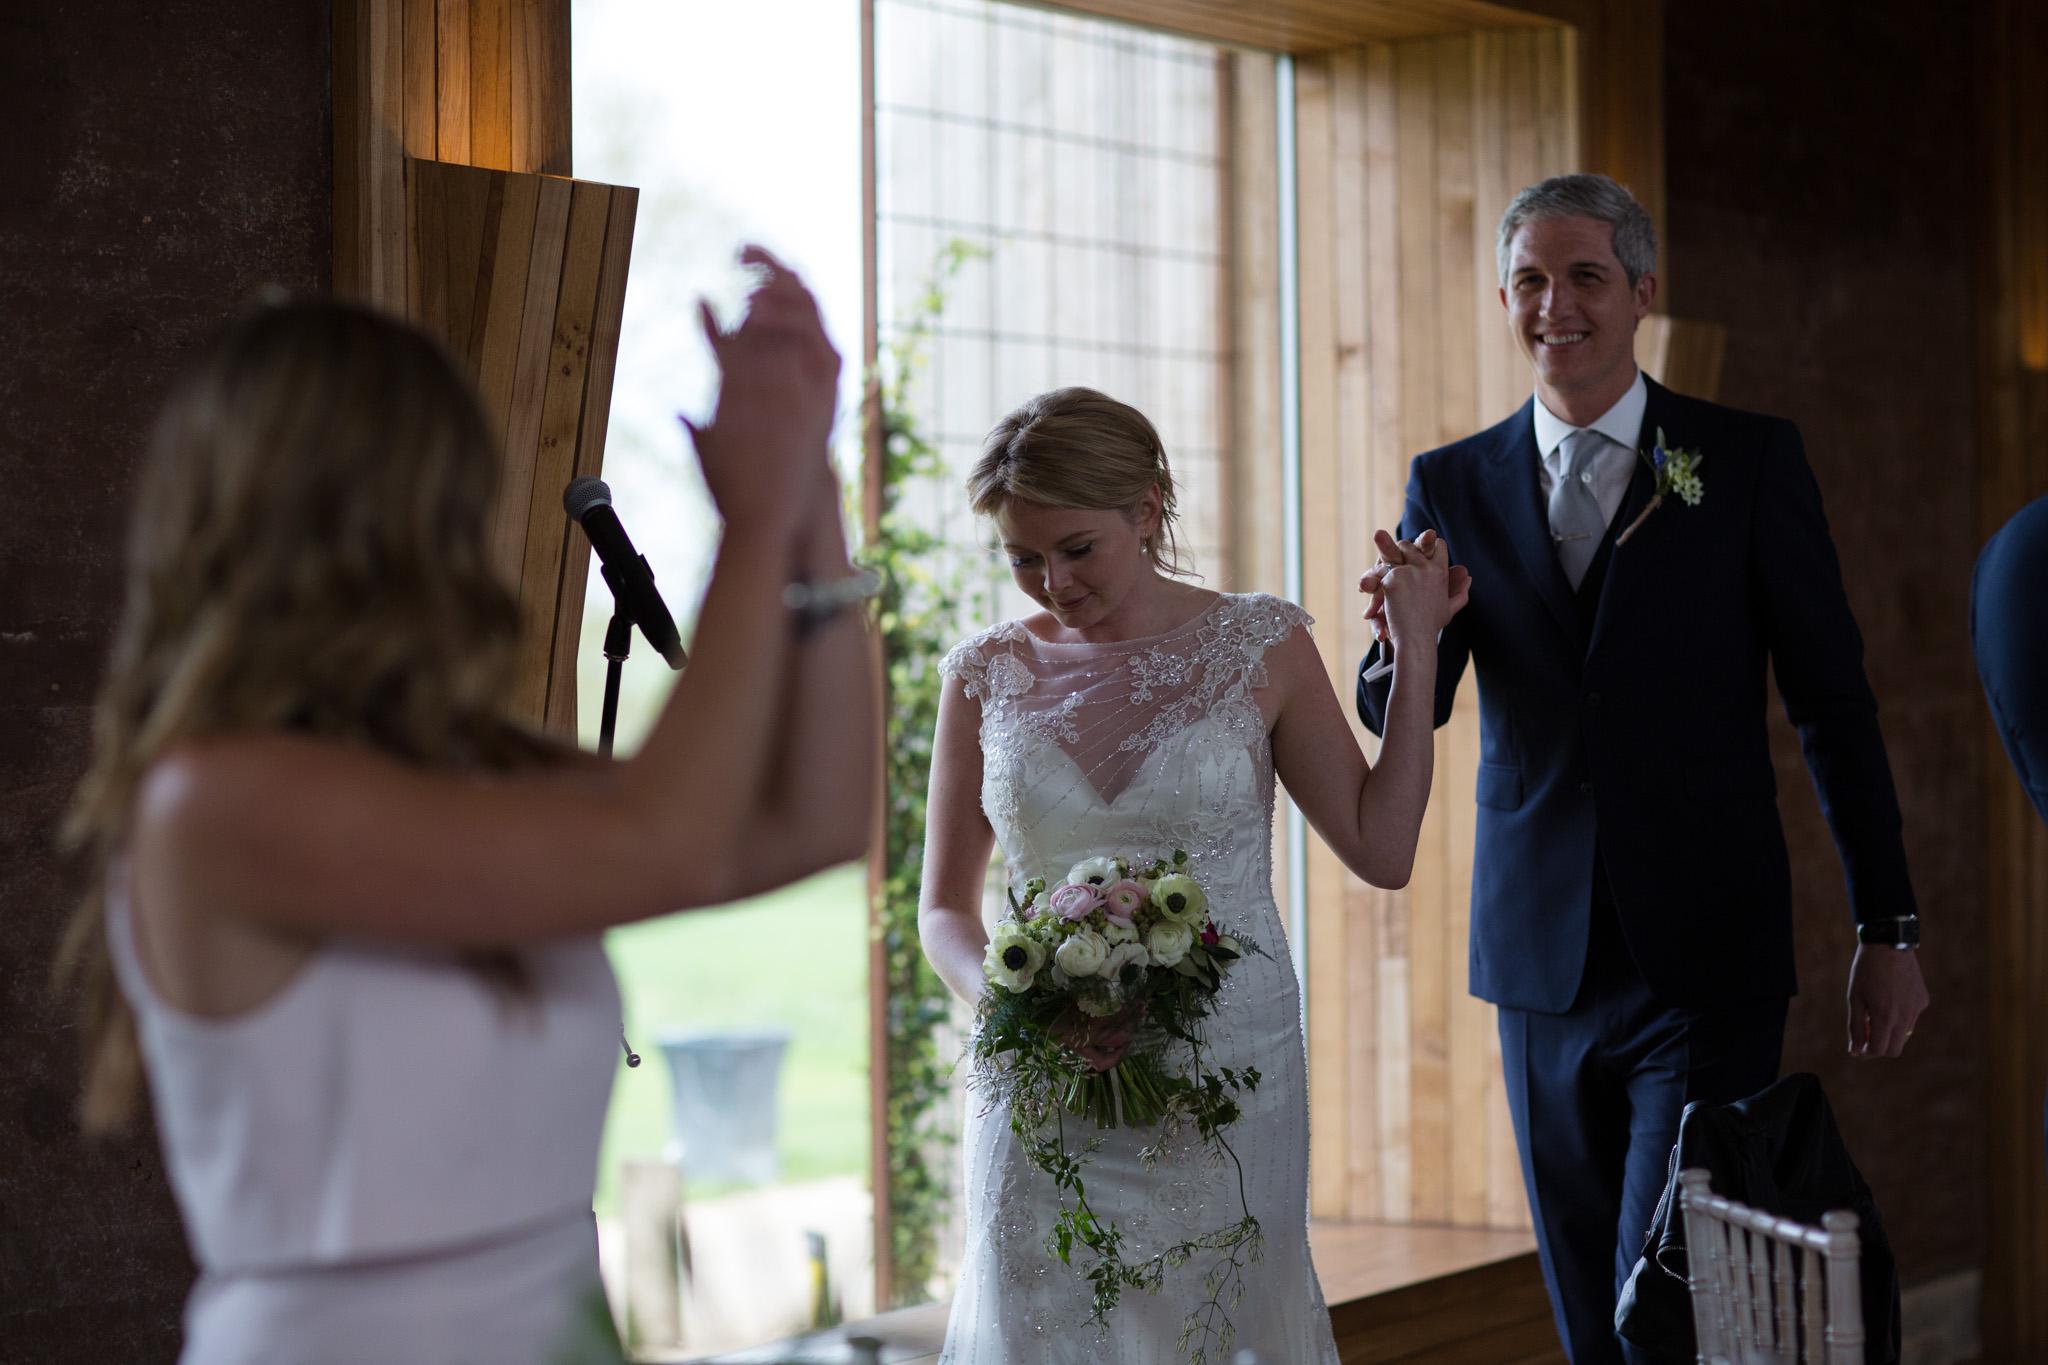 Mark_Barnes_Gloucester_Wedding_Photographer_Elmore_Court_Wedding_Photography_Mike+Kelly-79.jpg